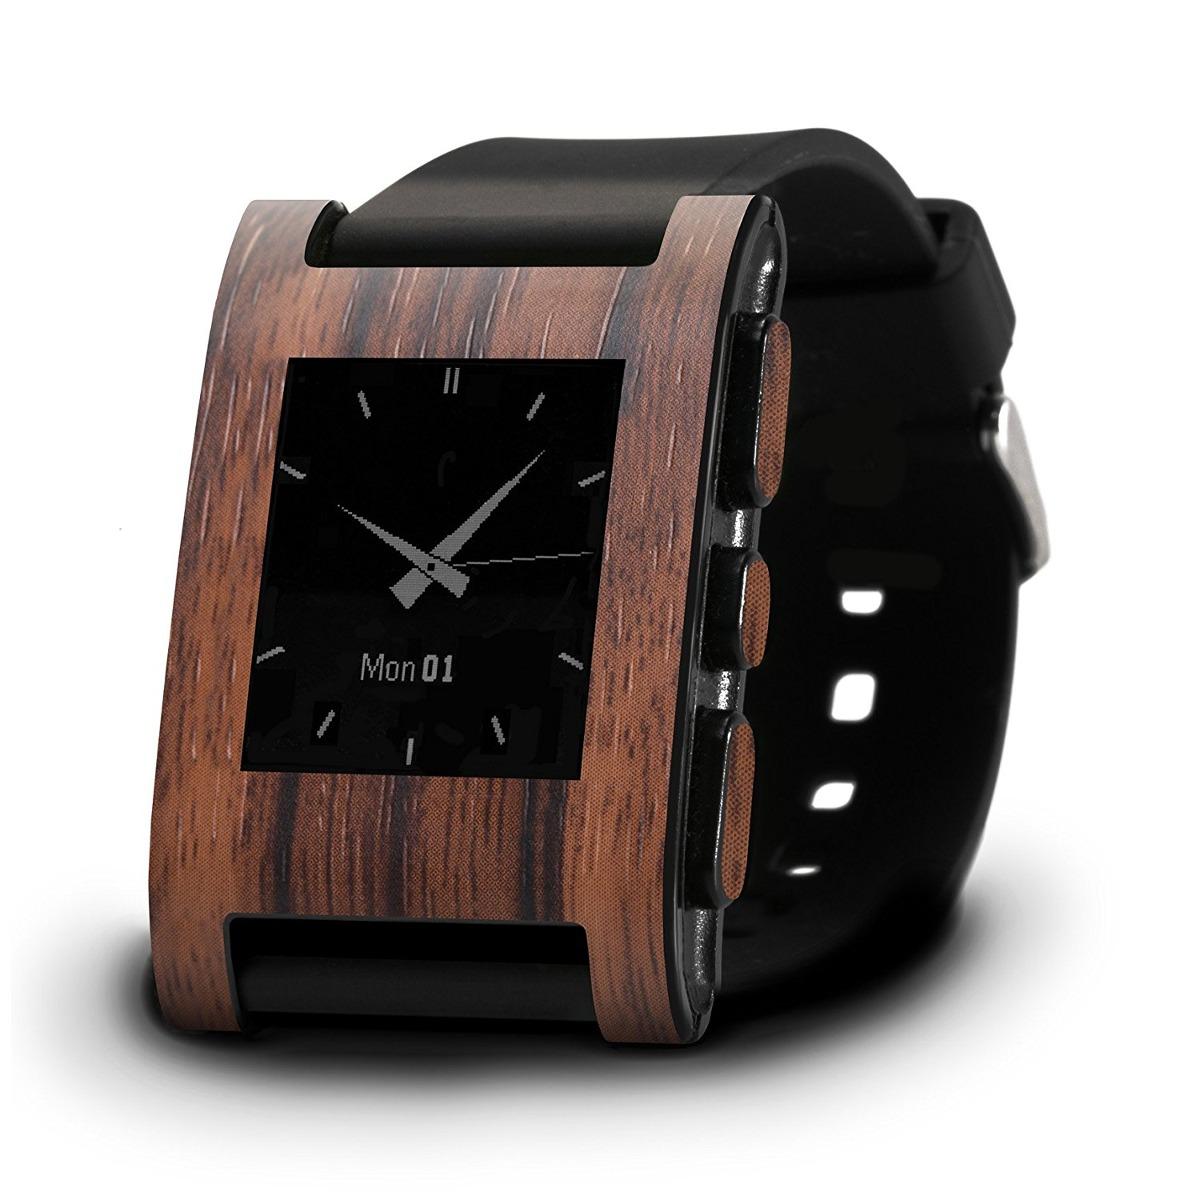 Frustration Carcasa Ébano Slickwrapspebble Wood Skin Reloj PuTXkZOlwi